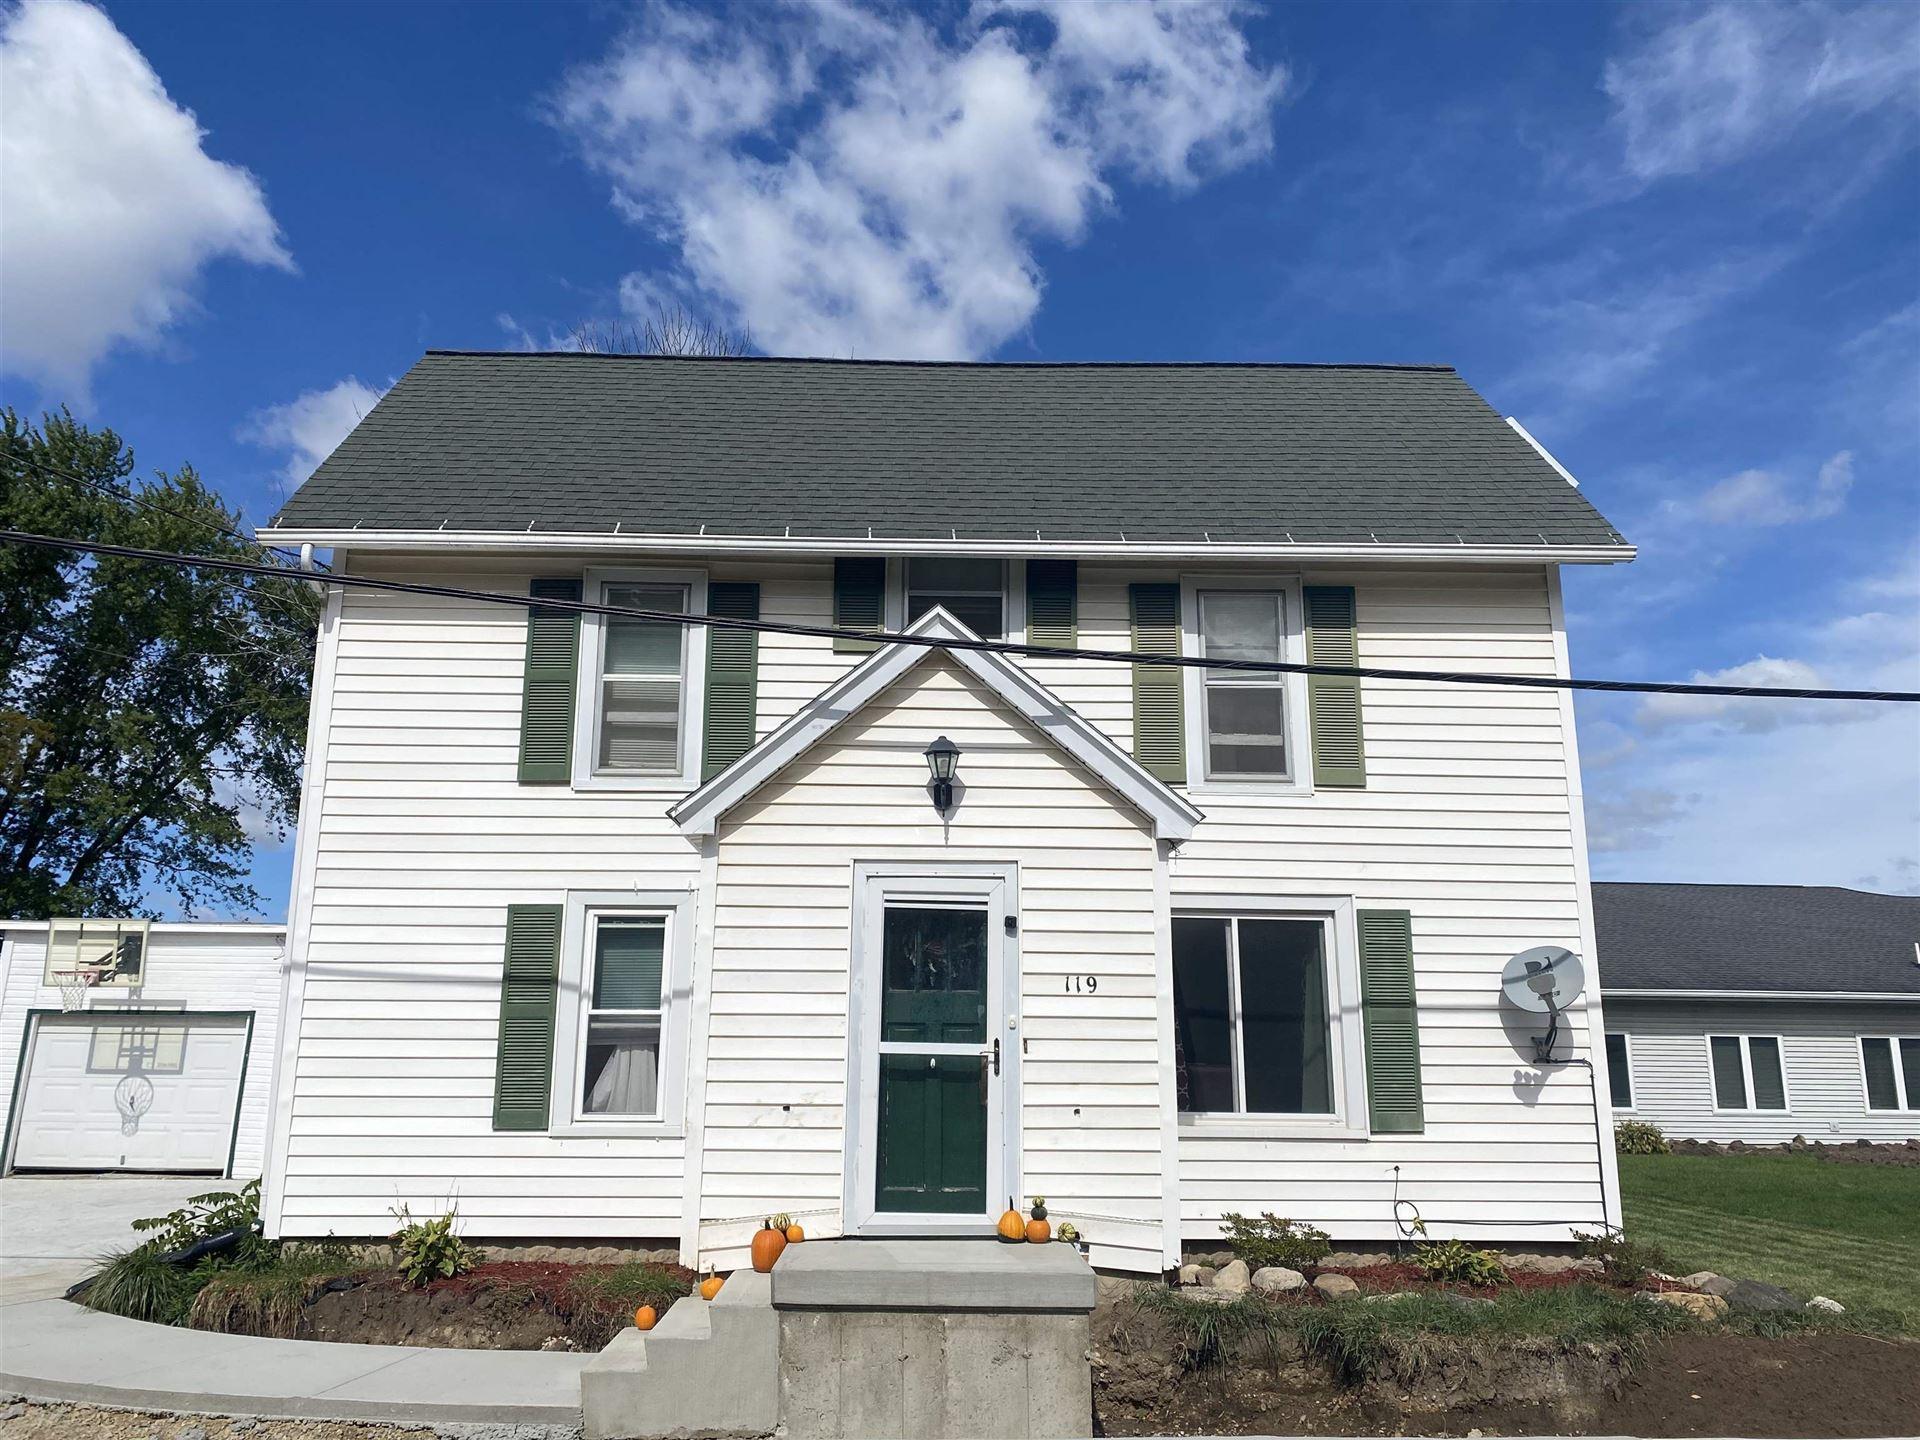 119 Clark St, Cottage Grove, WI 53527 - MLS#: 1920392